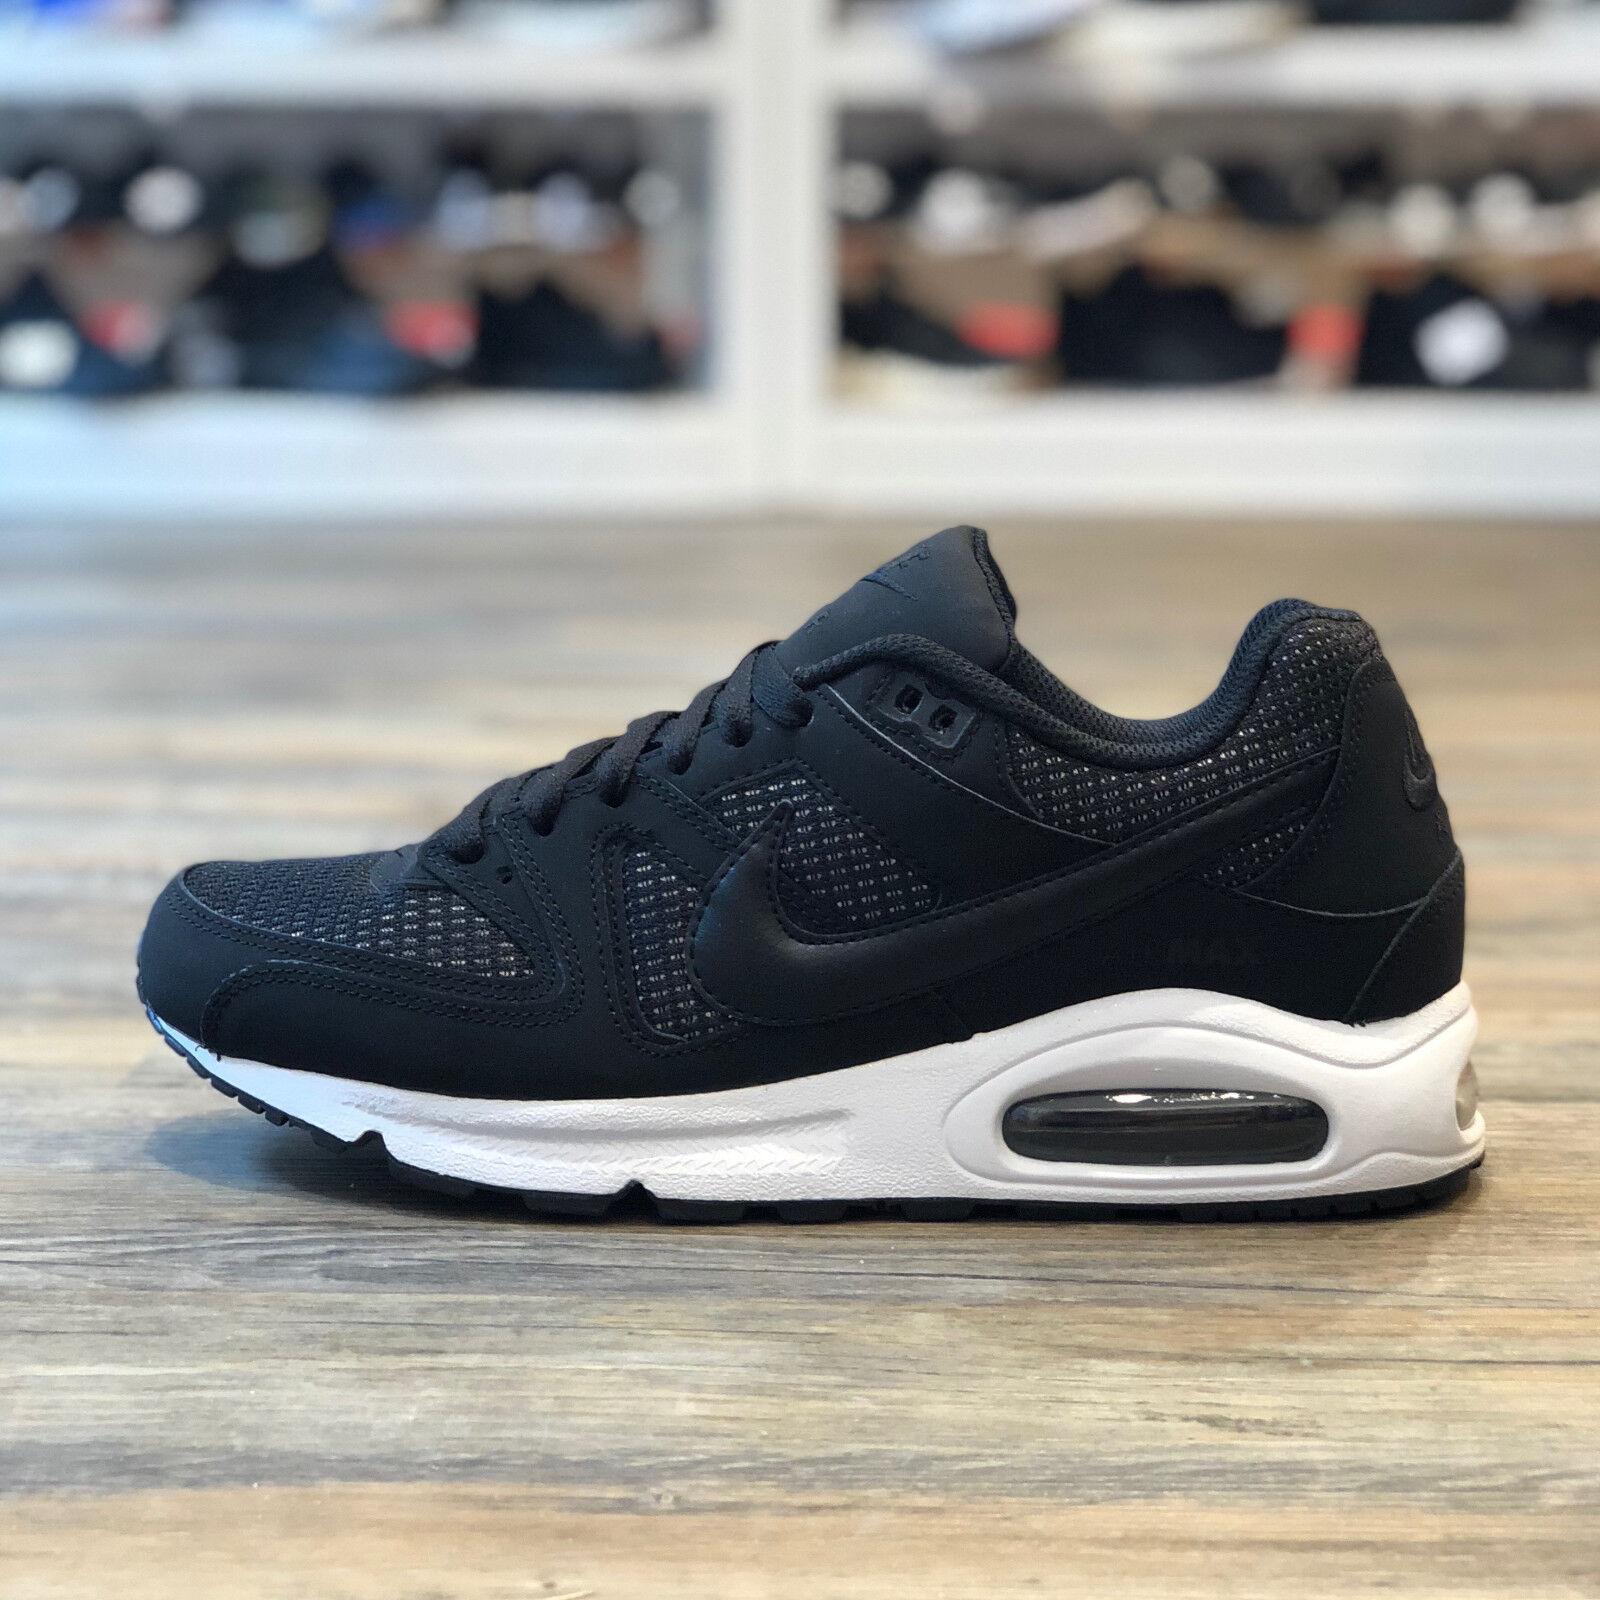 Nike Air Max Command Gr.43 Schuhe Turnschuhe schwarz weiß schuhe Turn 397690 091